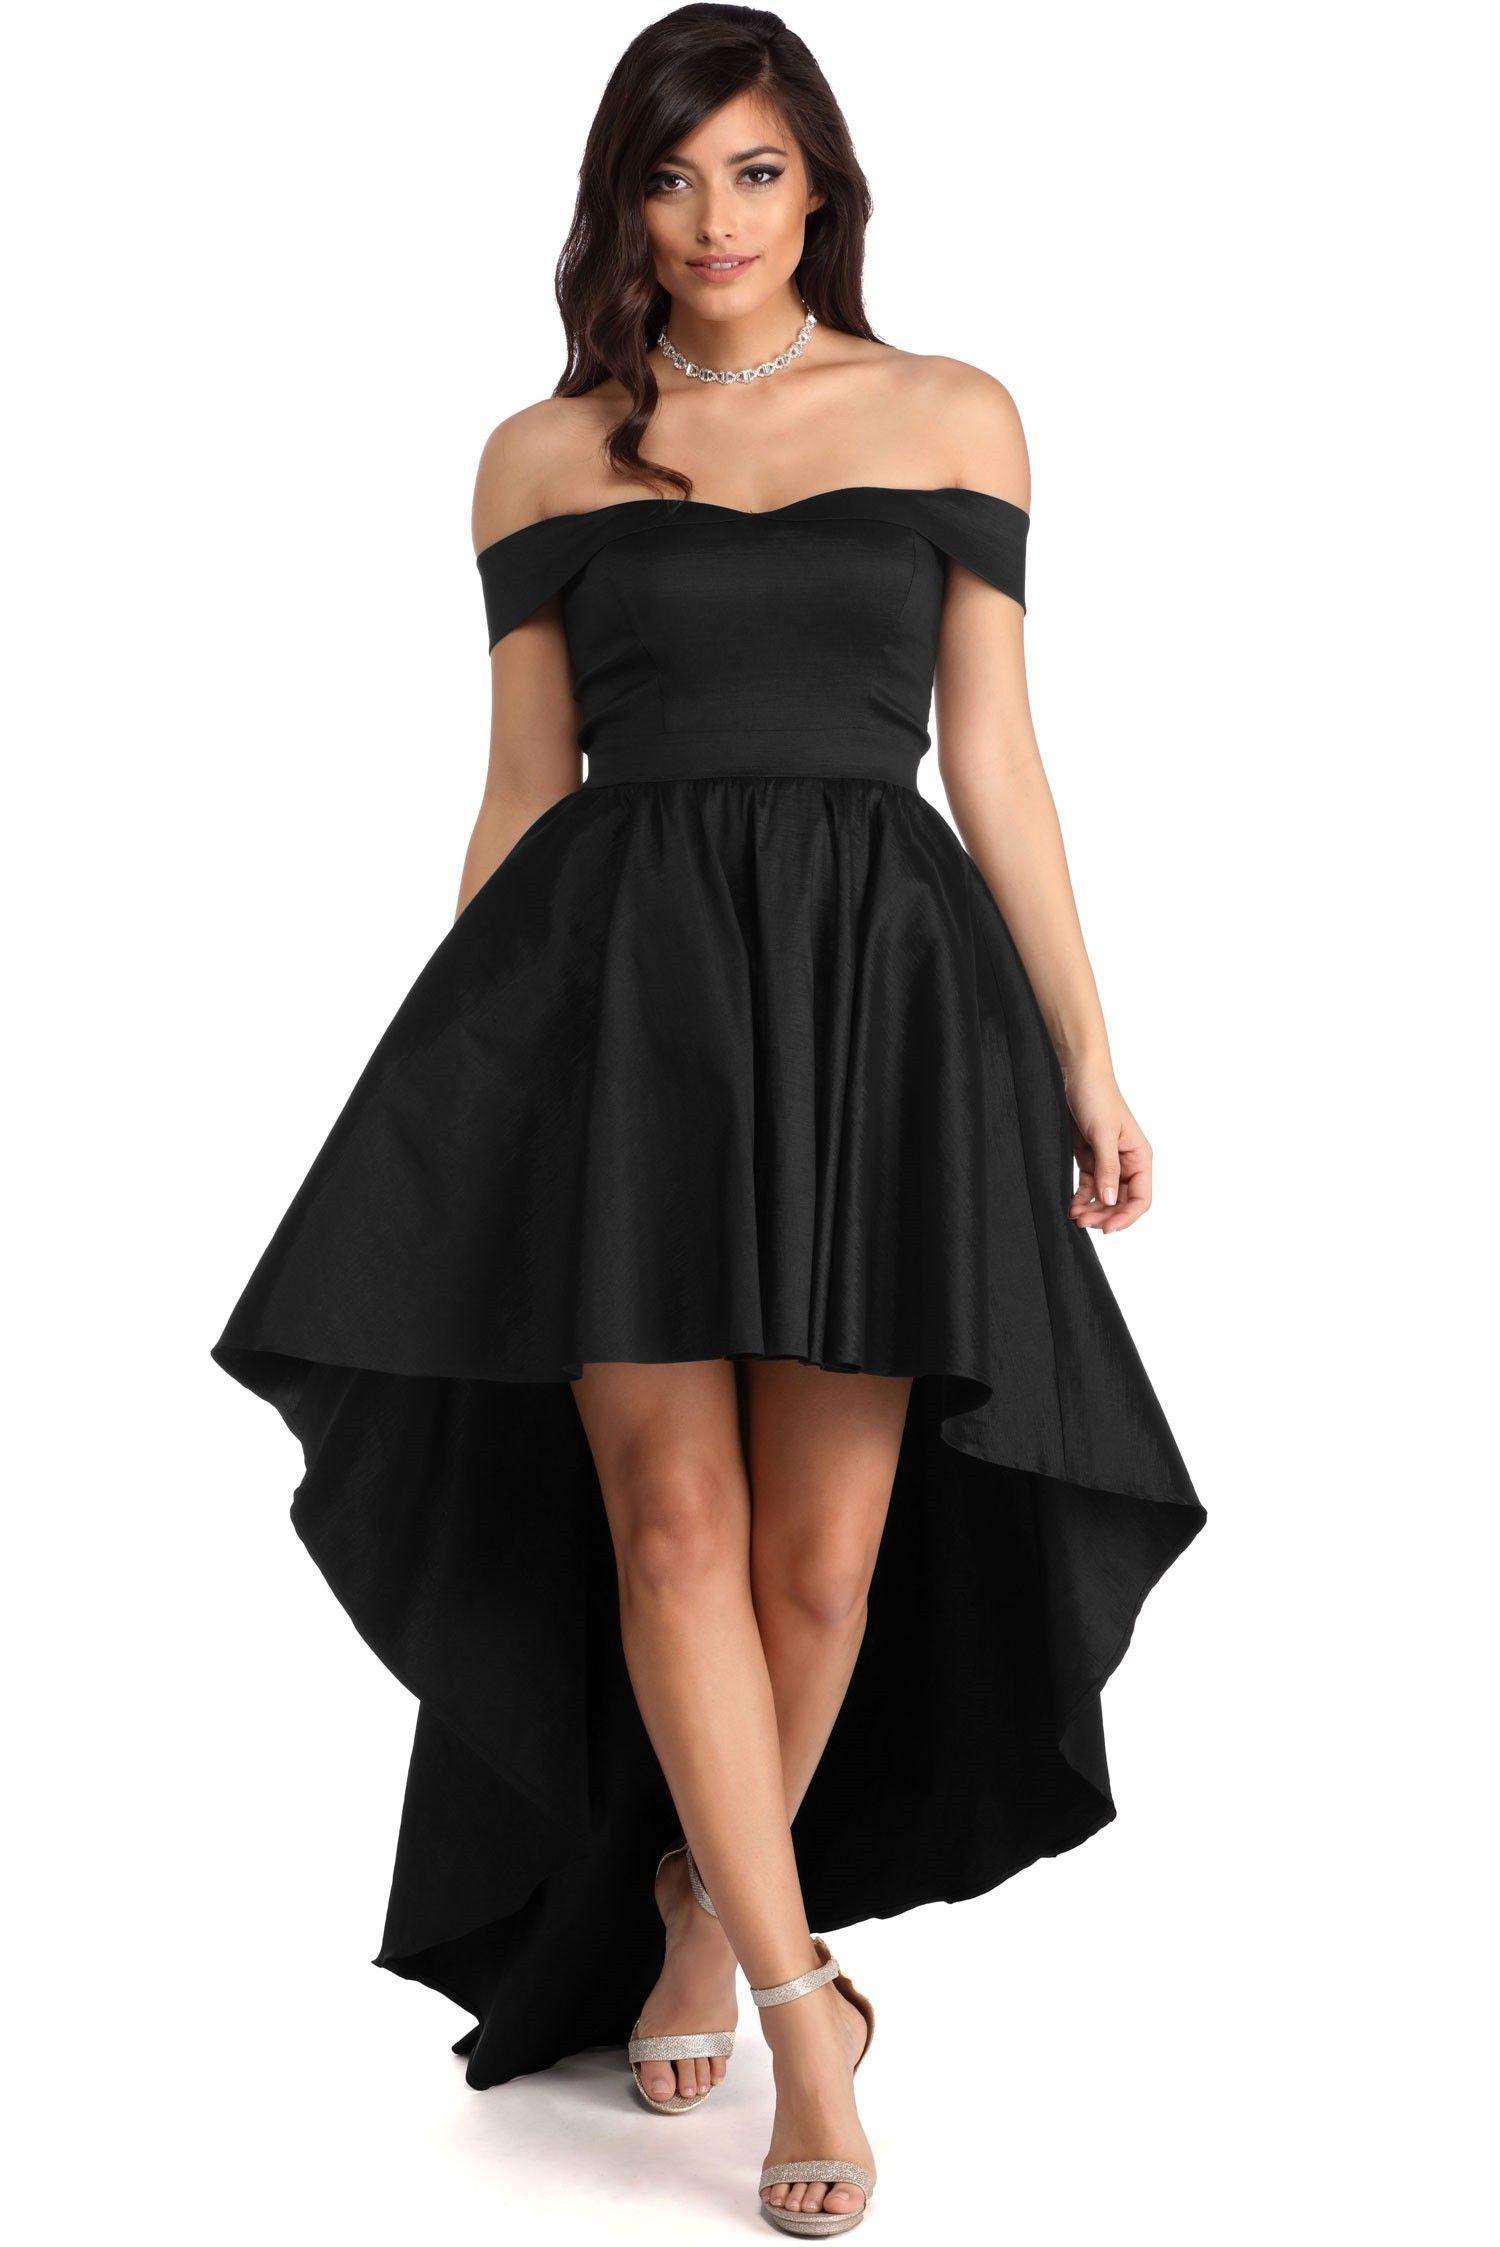 f7ce01f03105 Ora Black Taffeta Gown in 2019 | Prom/ homecoming dresses | Dresses ...